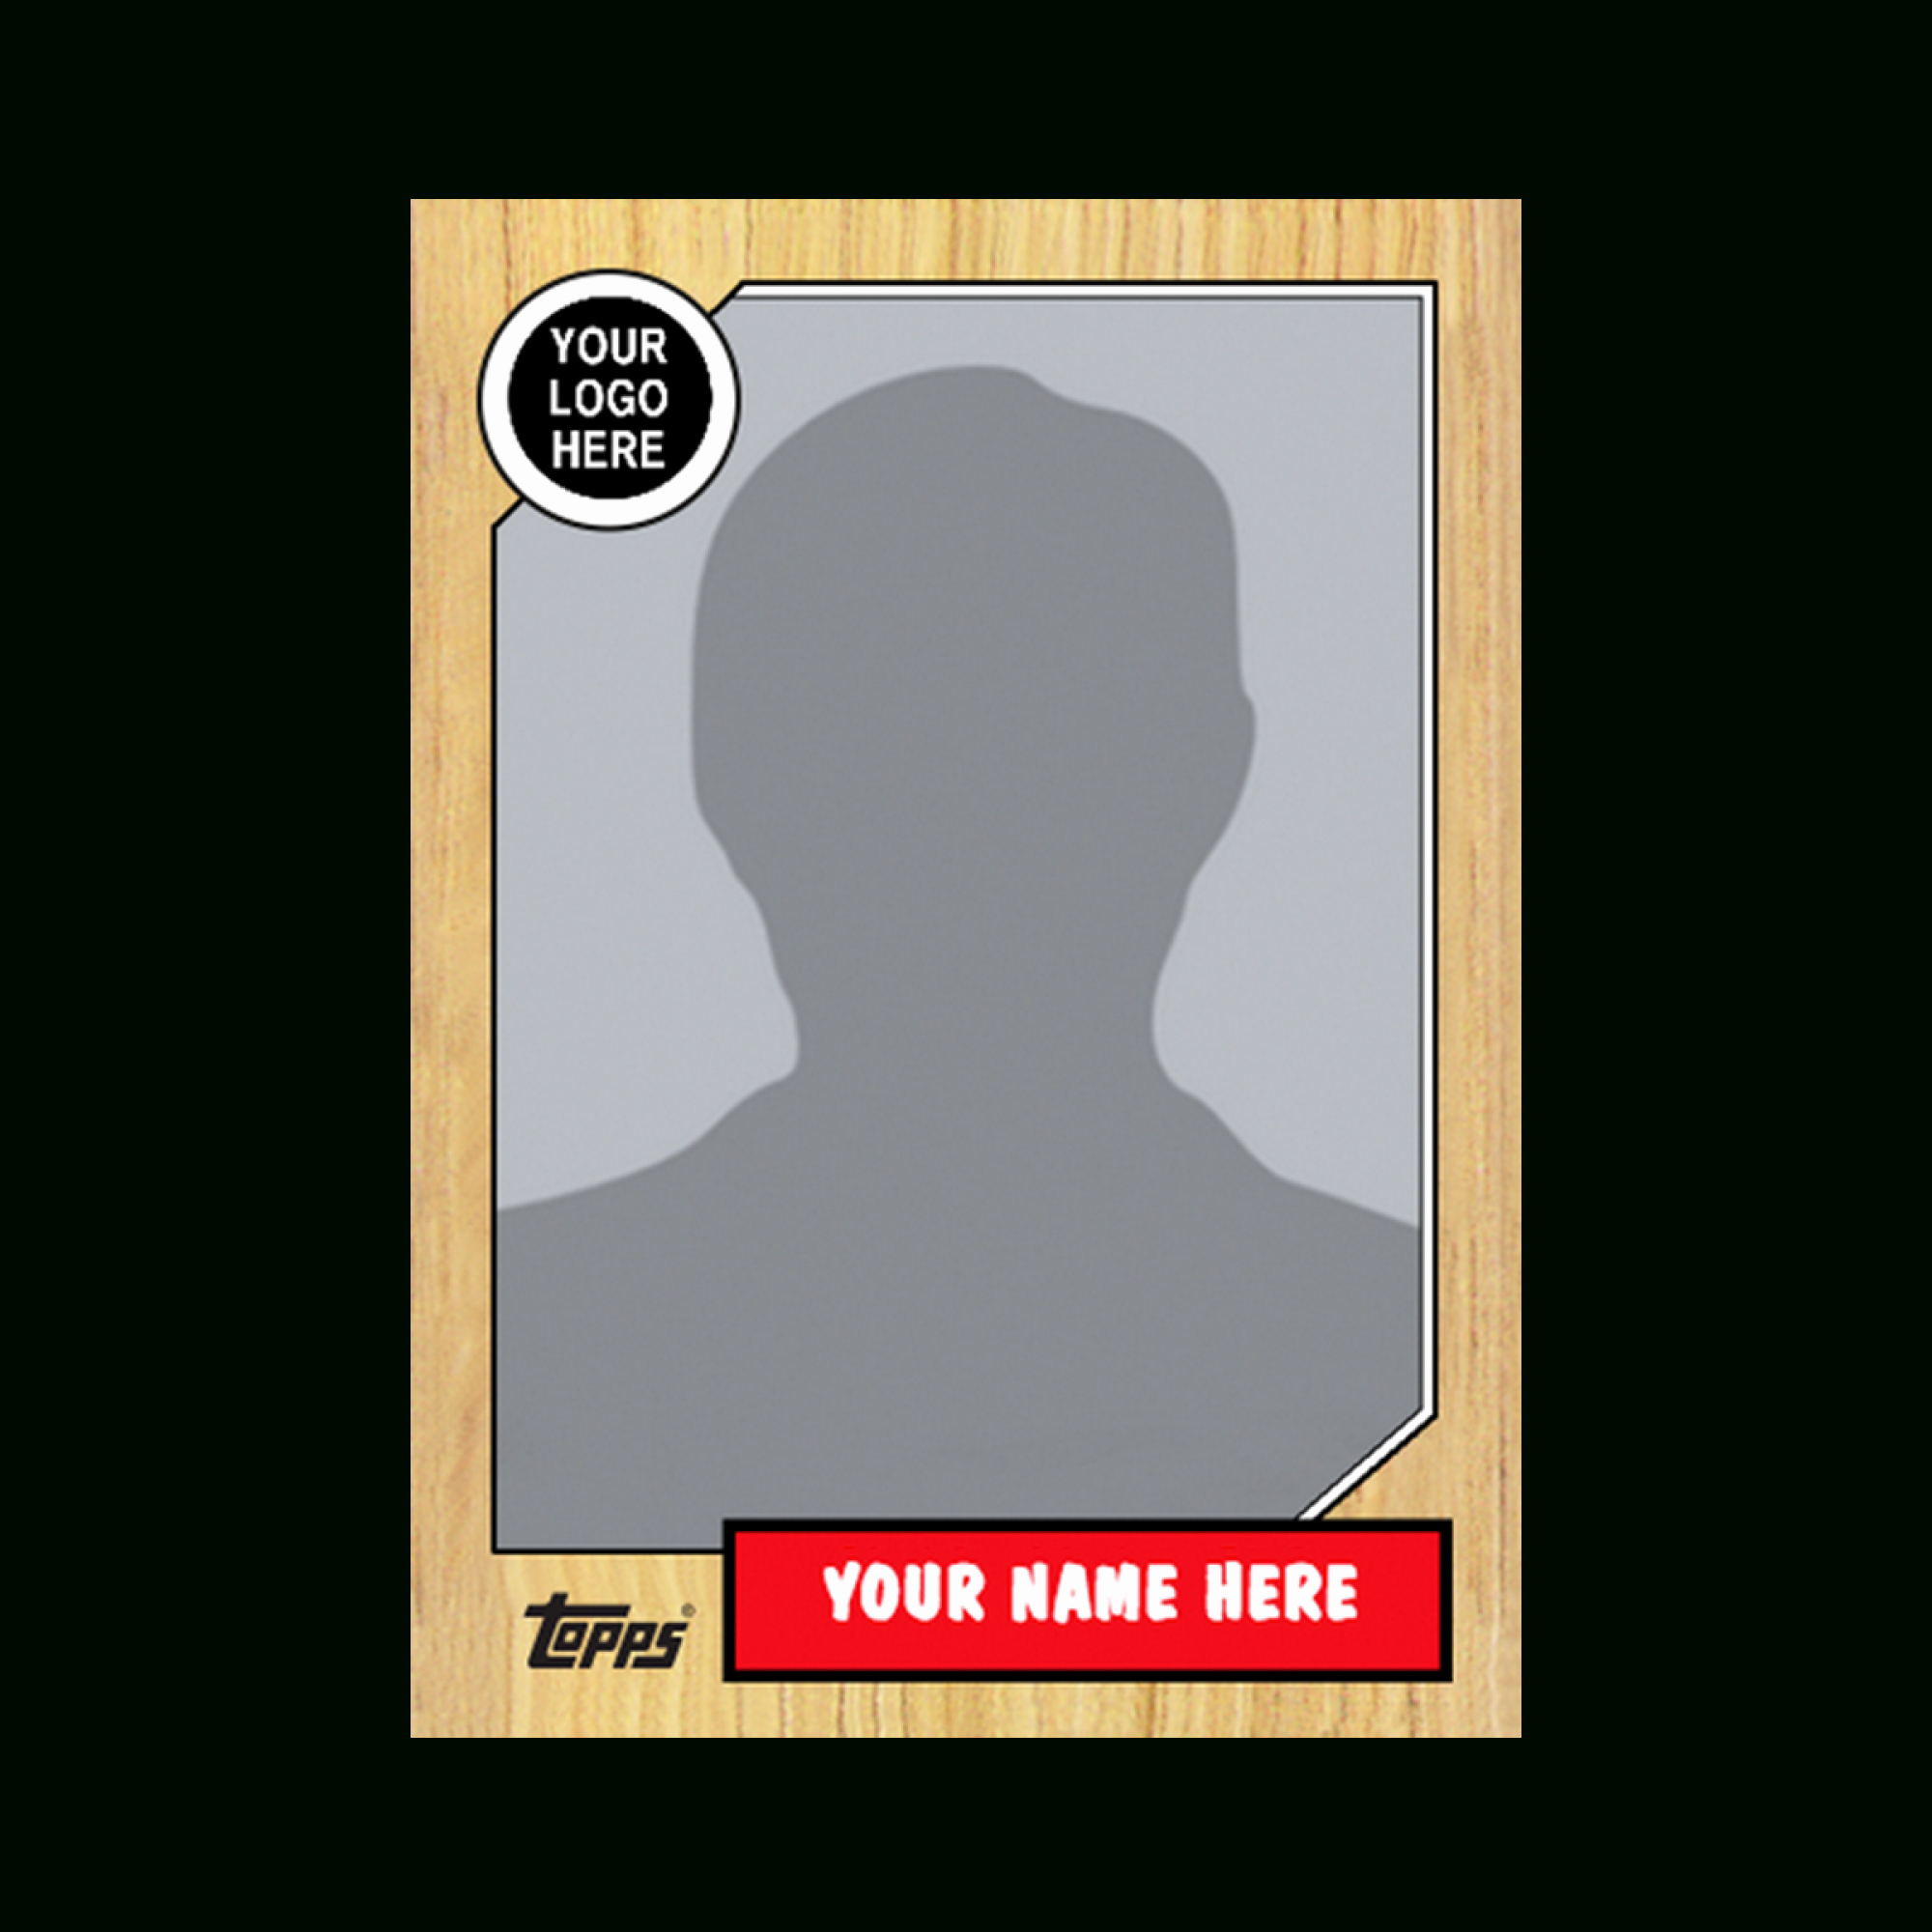 Blank Trading Card Template Lovely Baseball Card Template